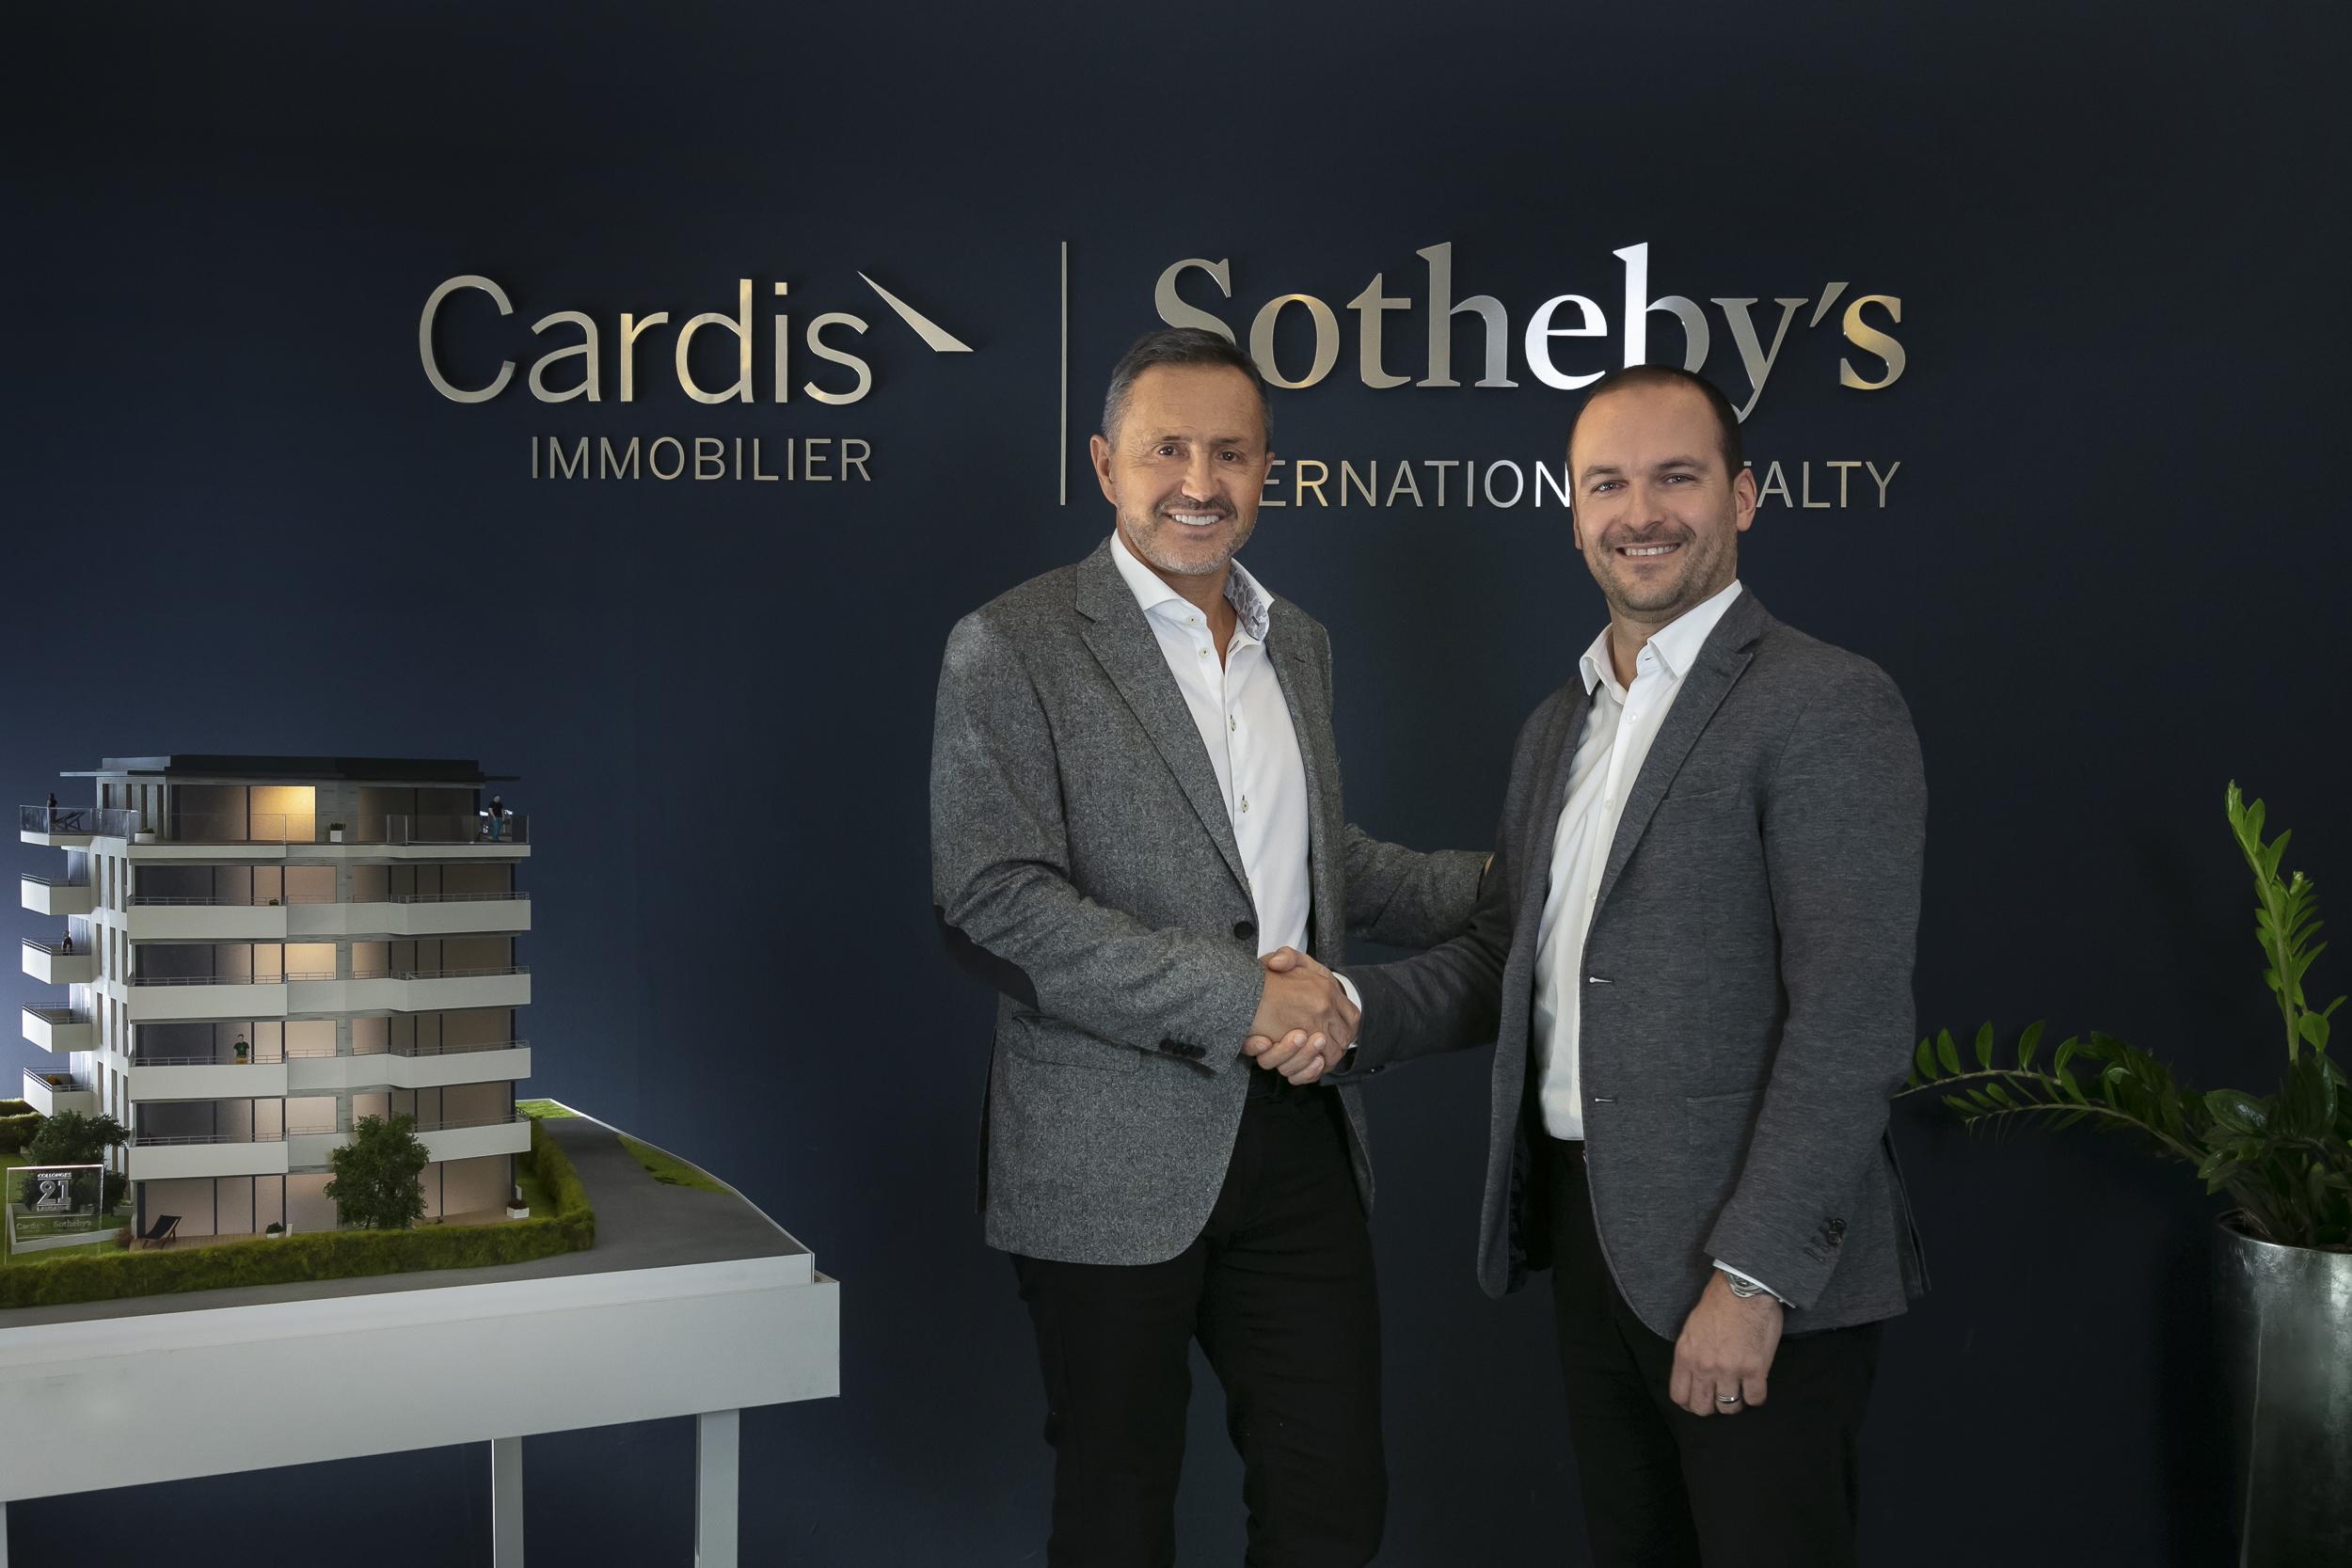 Bon exercice 2018 pour Cardis | Sotheby's International Realty